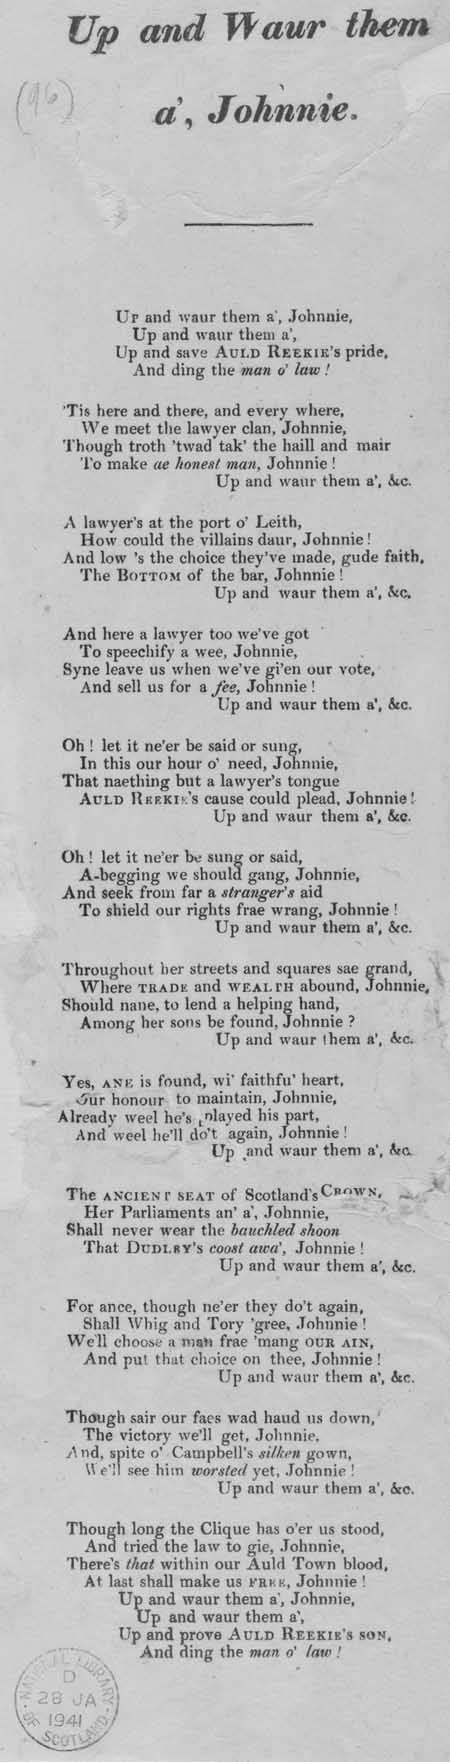 Broadside ballad entitled 'Up and Waur Them A', Johnnie'